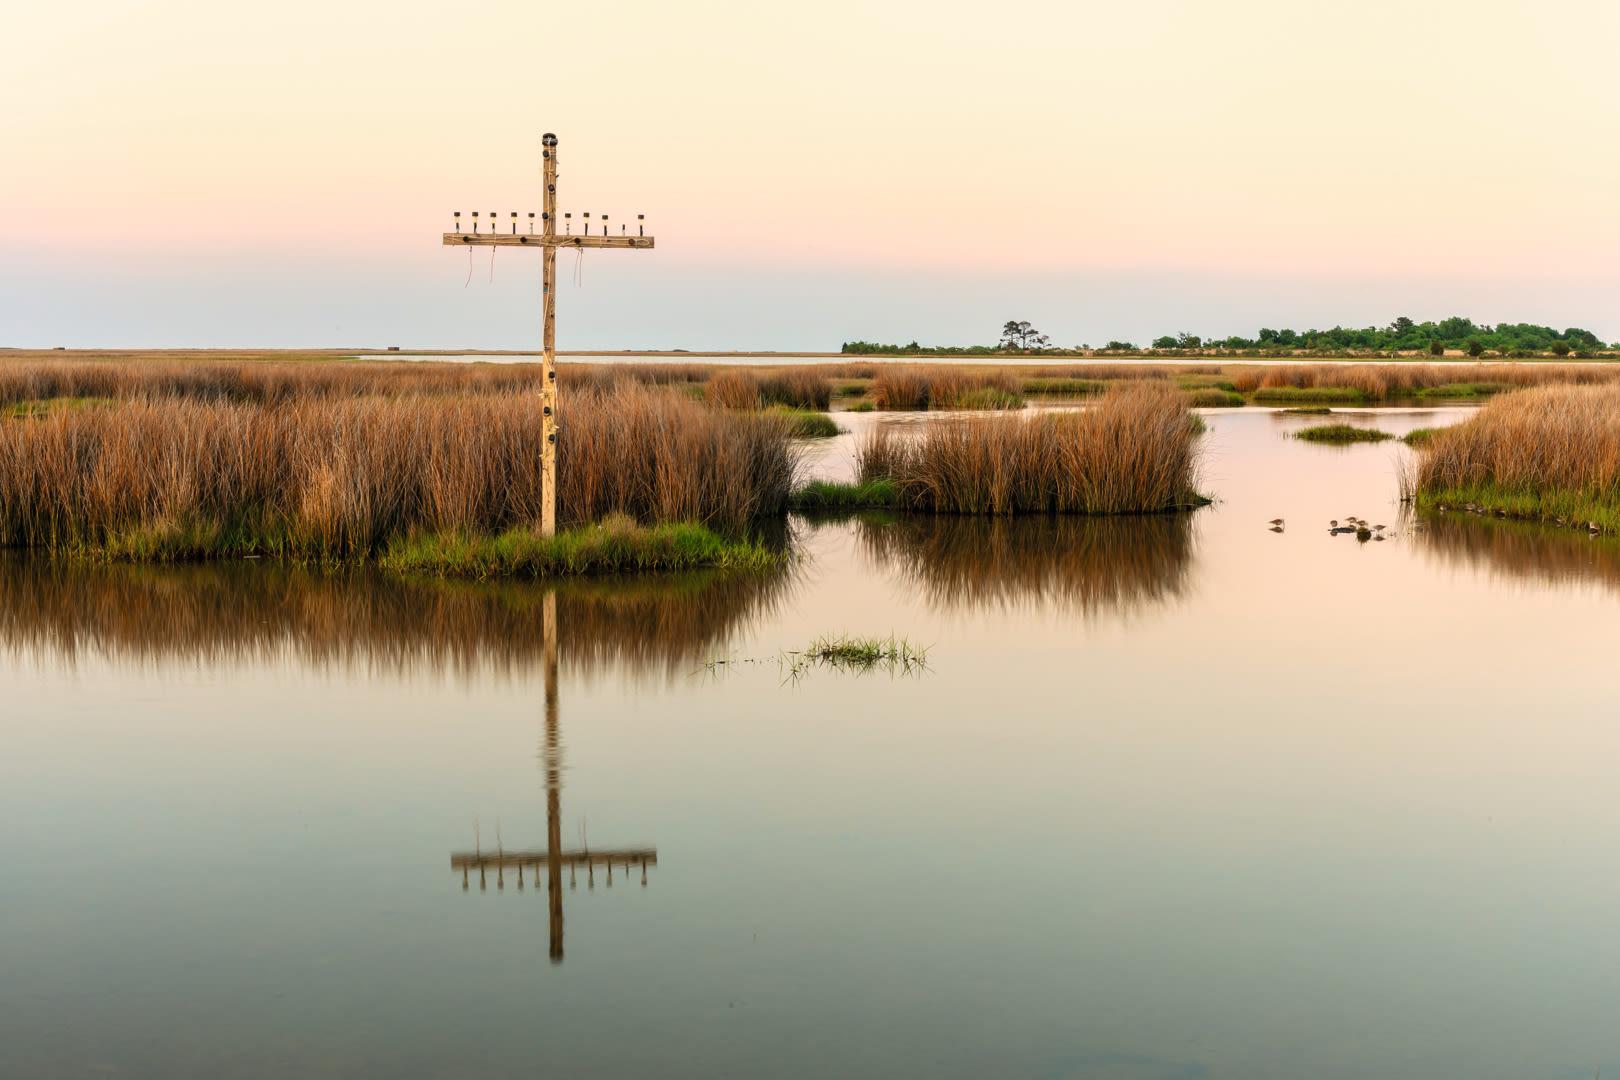 SWAROVSKI OPTIK Closer Birding-Magazin, 2020, Cross standing in marsh of Chesapeake Bay, Poquoson, Virginia, United States